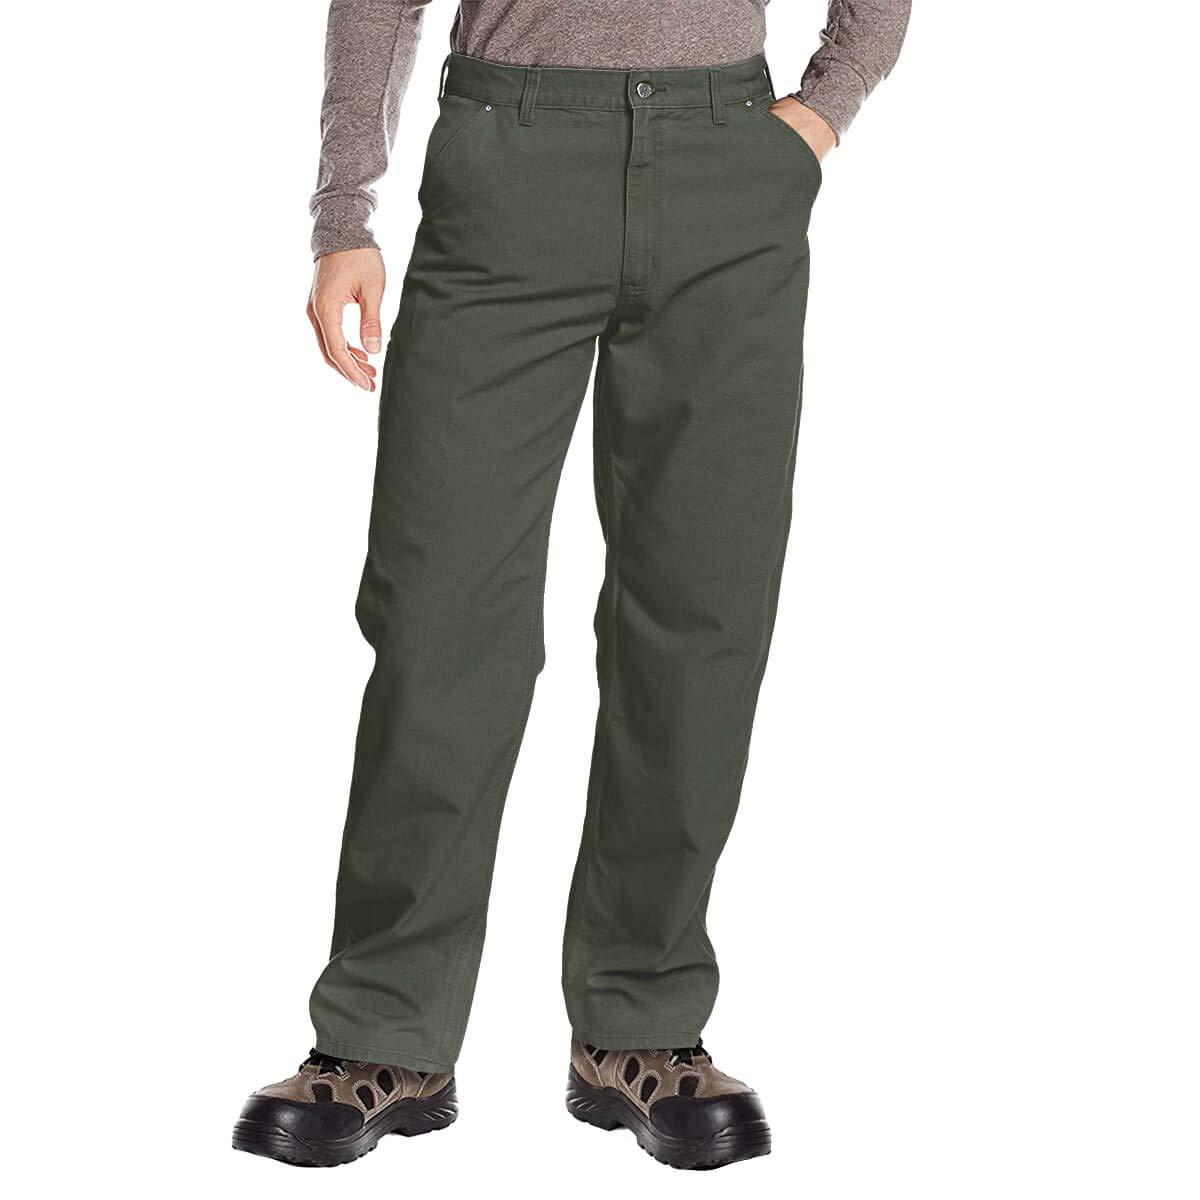 DuraDrive 38W x 32L Dark Grey Mens Loose Fit Garment Washed Duck Canvas Work Dungaree Carpenter Pants